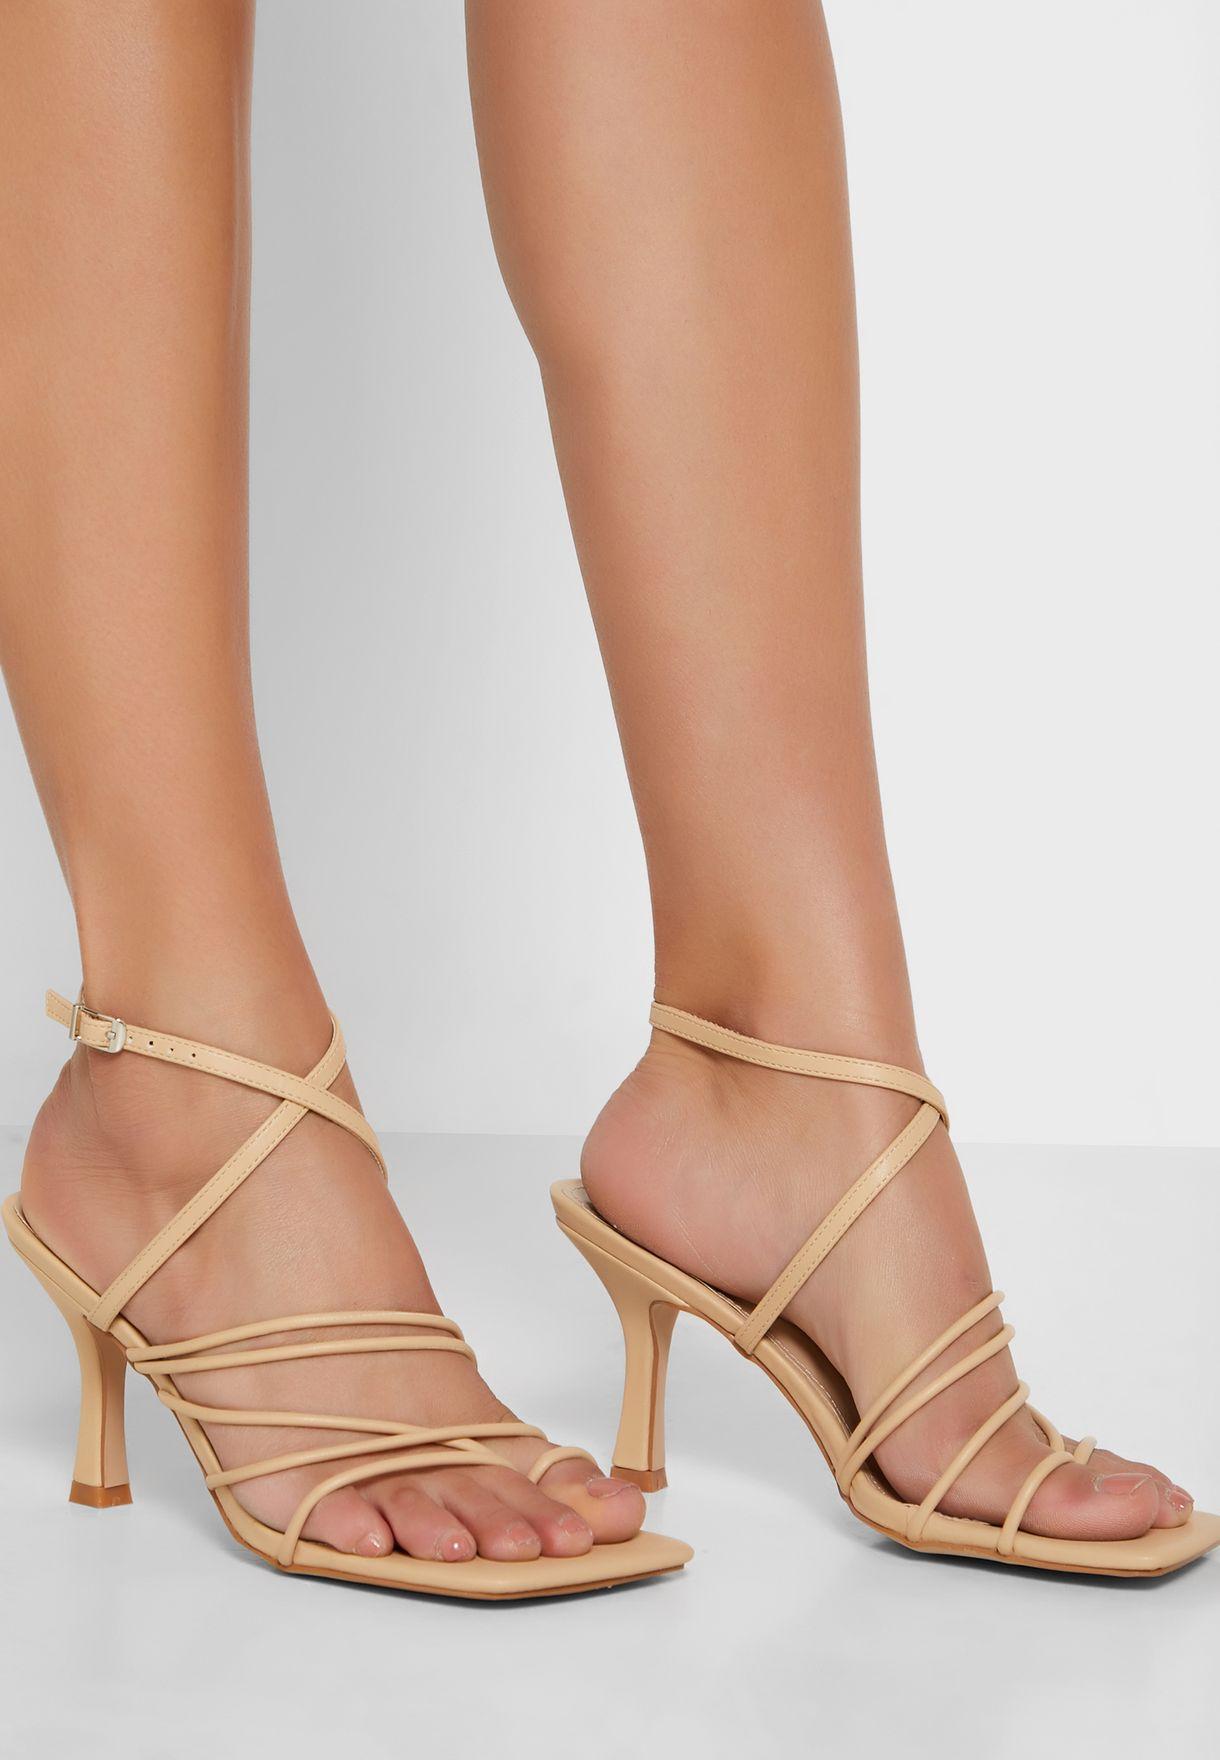 Multi-Strap Square Toe Stiletto Heel Sandal